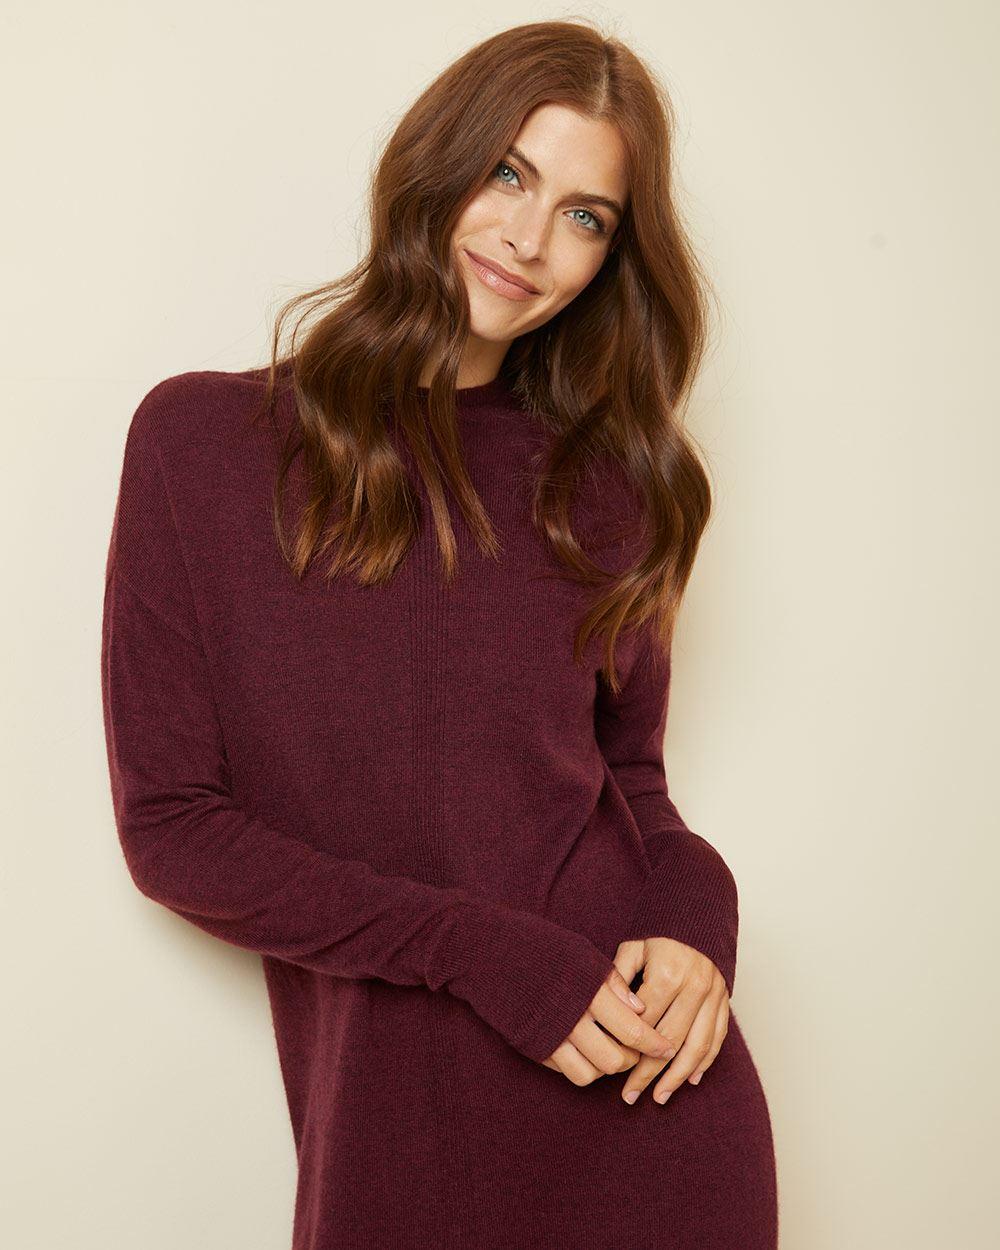 Cashmere-like Sweater dress